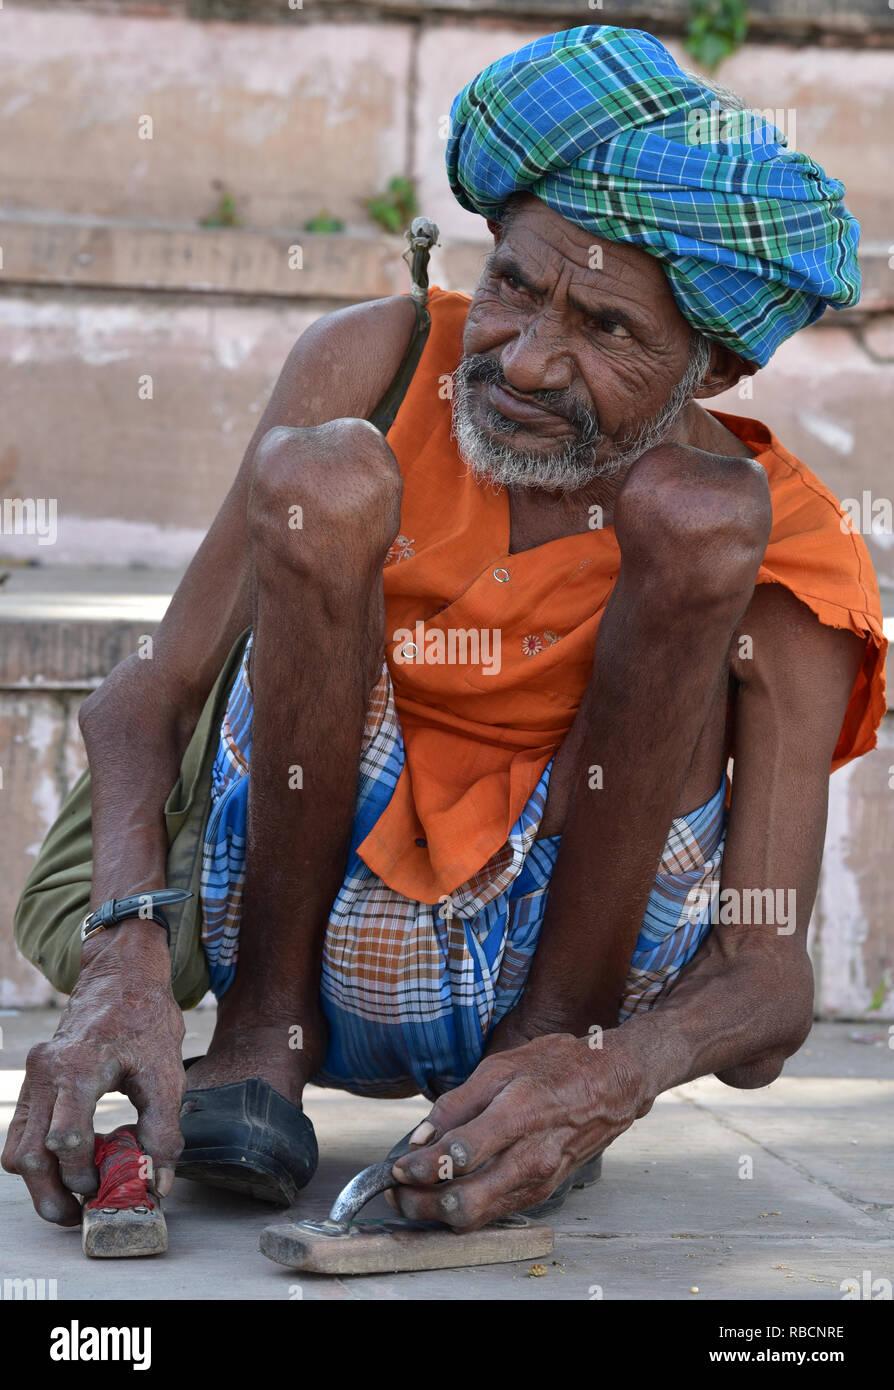 Indian man crouching on the banks of the holy Pushkar Lake, Rajasthan, Western India, Asia. - Stock Image